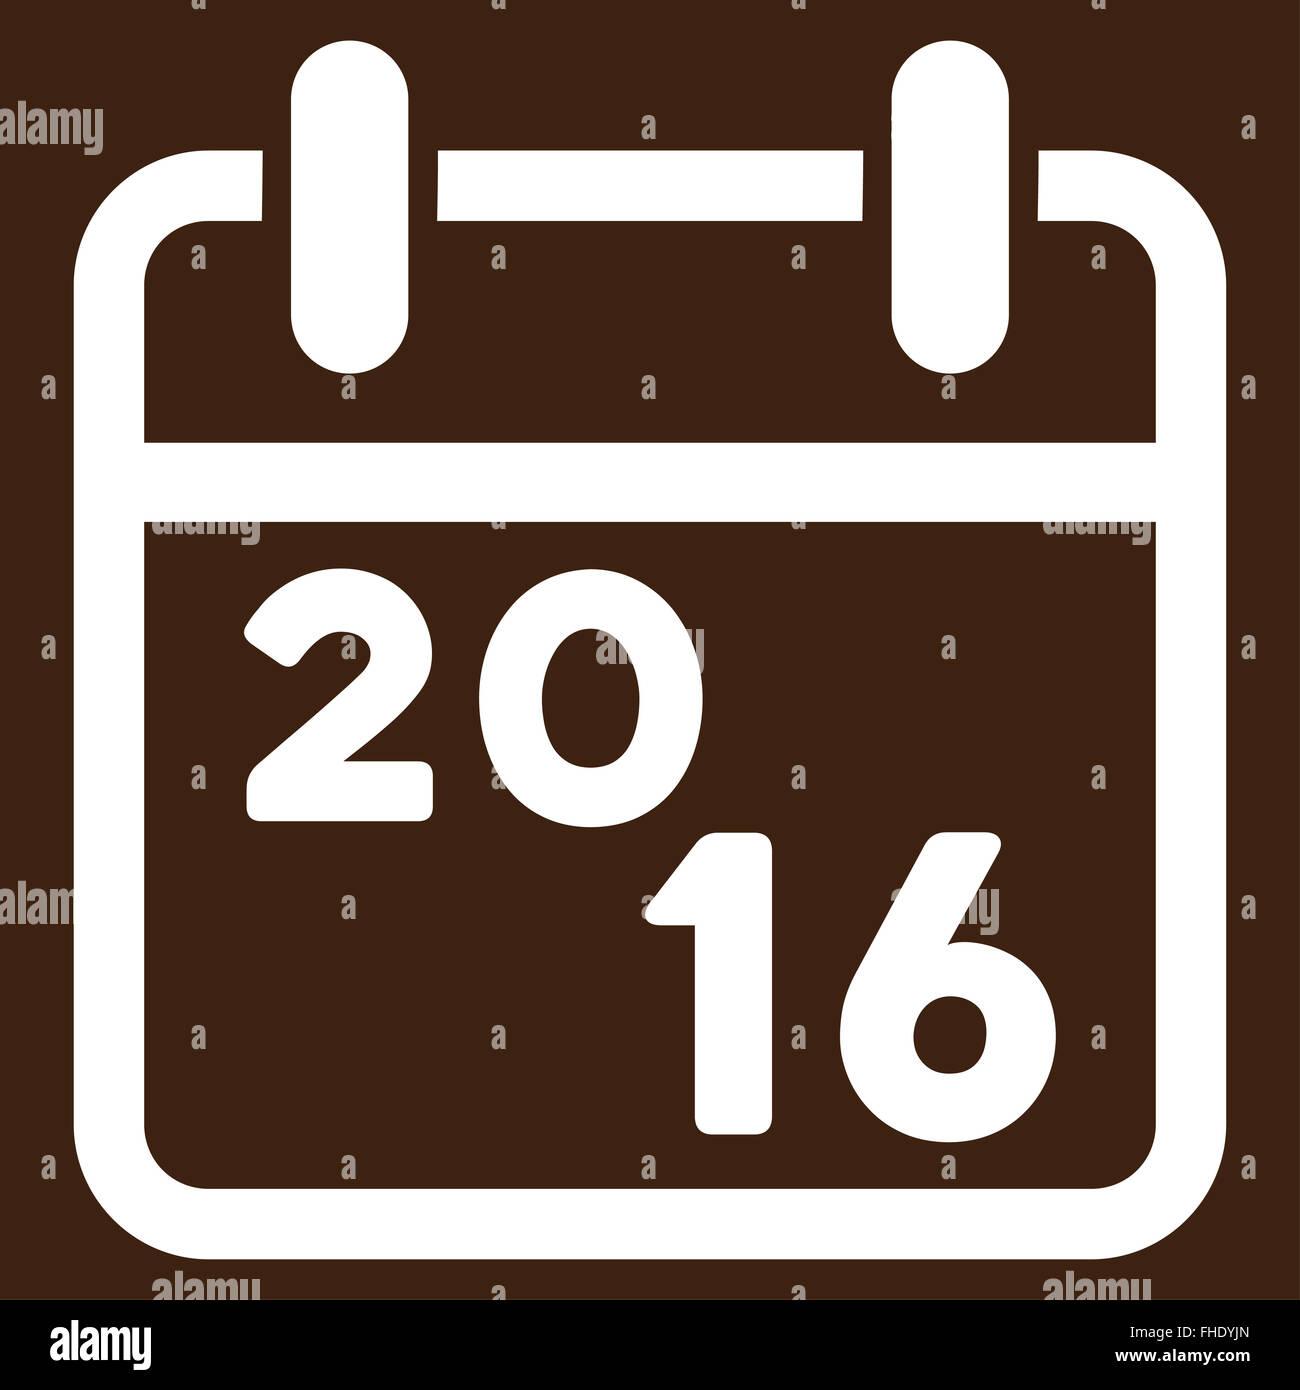 2016 binder icon stock photo royalty free image 96808061